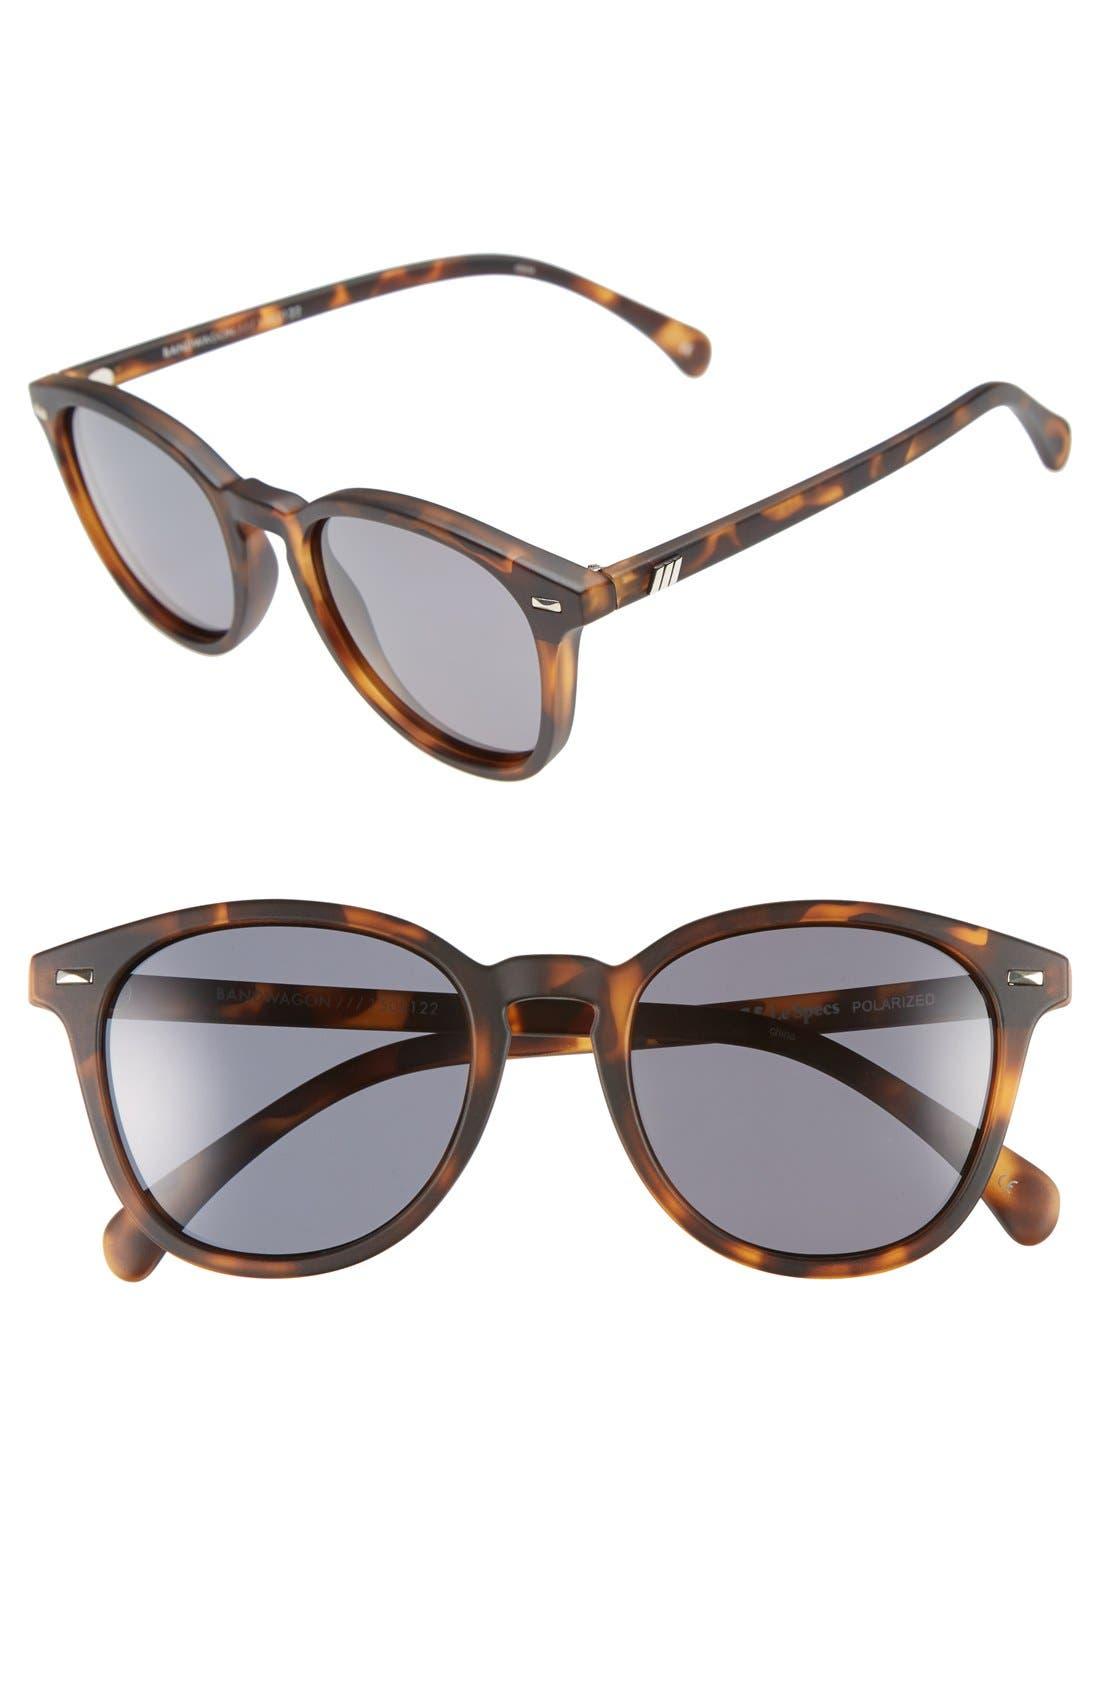 Main Image - Le Specs 'Bandwagon' 51mm Polarized Sunglasses